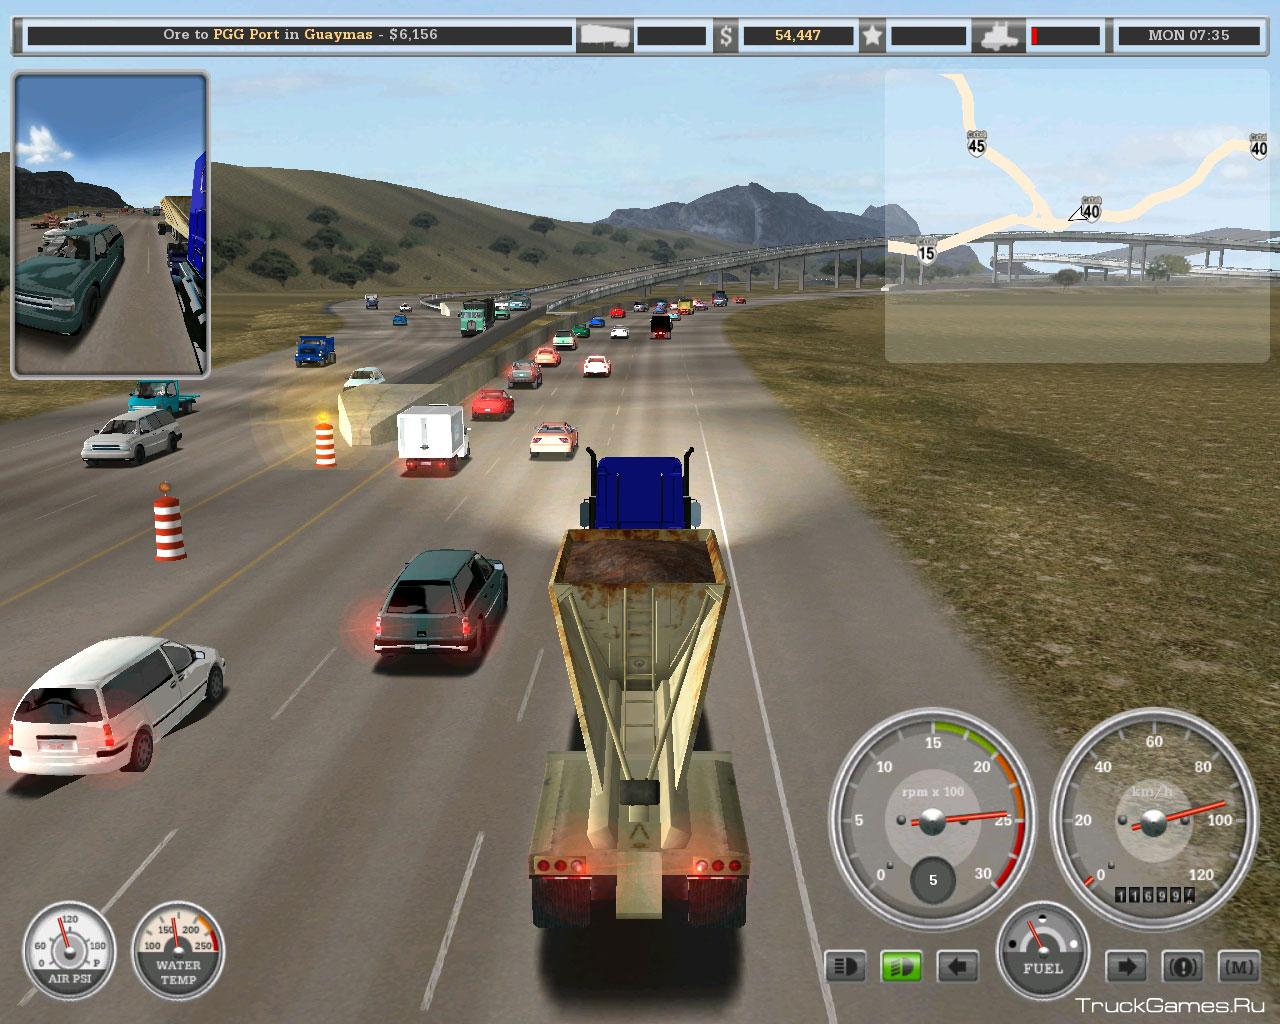 FREE DOWNLOAD GAME Hard Truck: 18 Wheels of Steel FULL